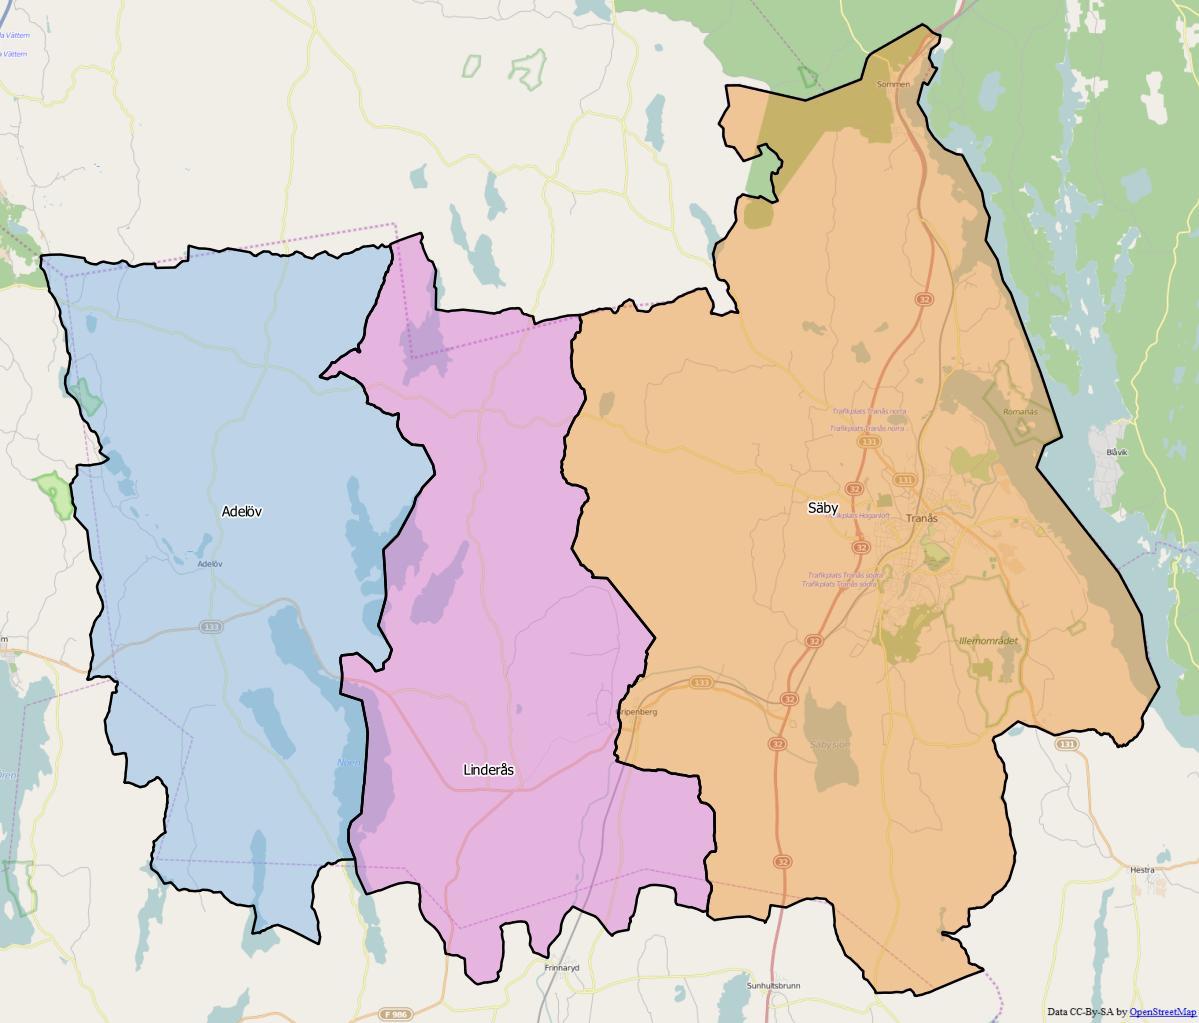 Tranås Kommun: Säby Distrikt, Småland